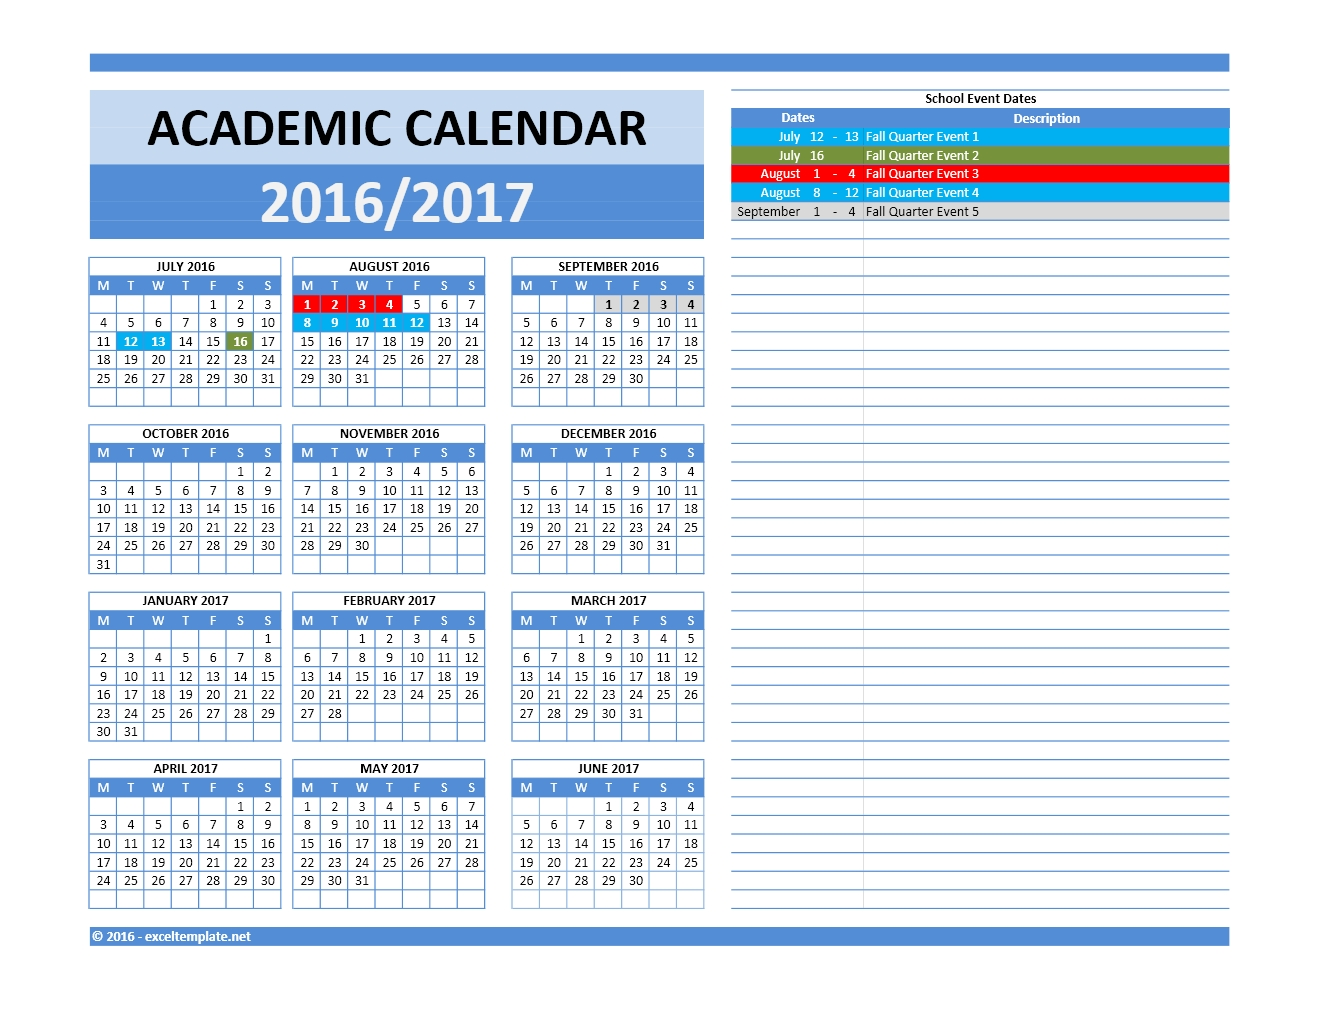 School Event Calendar Template